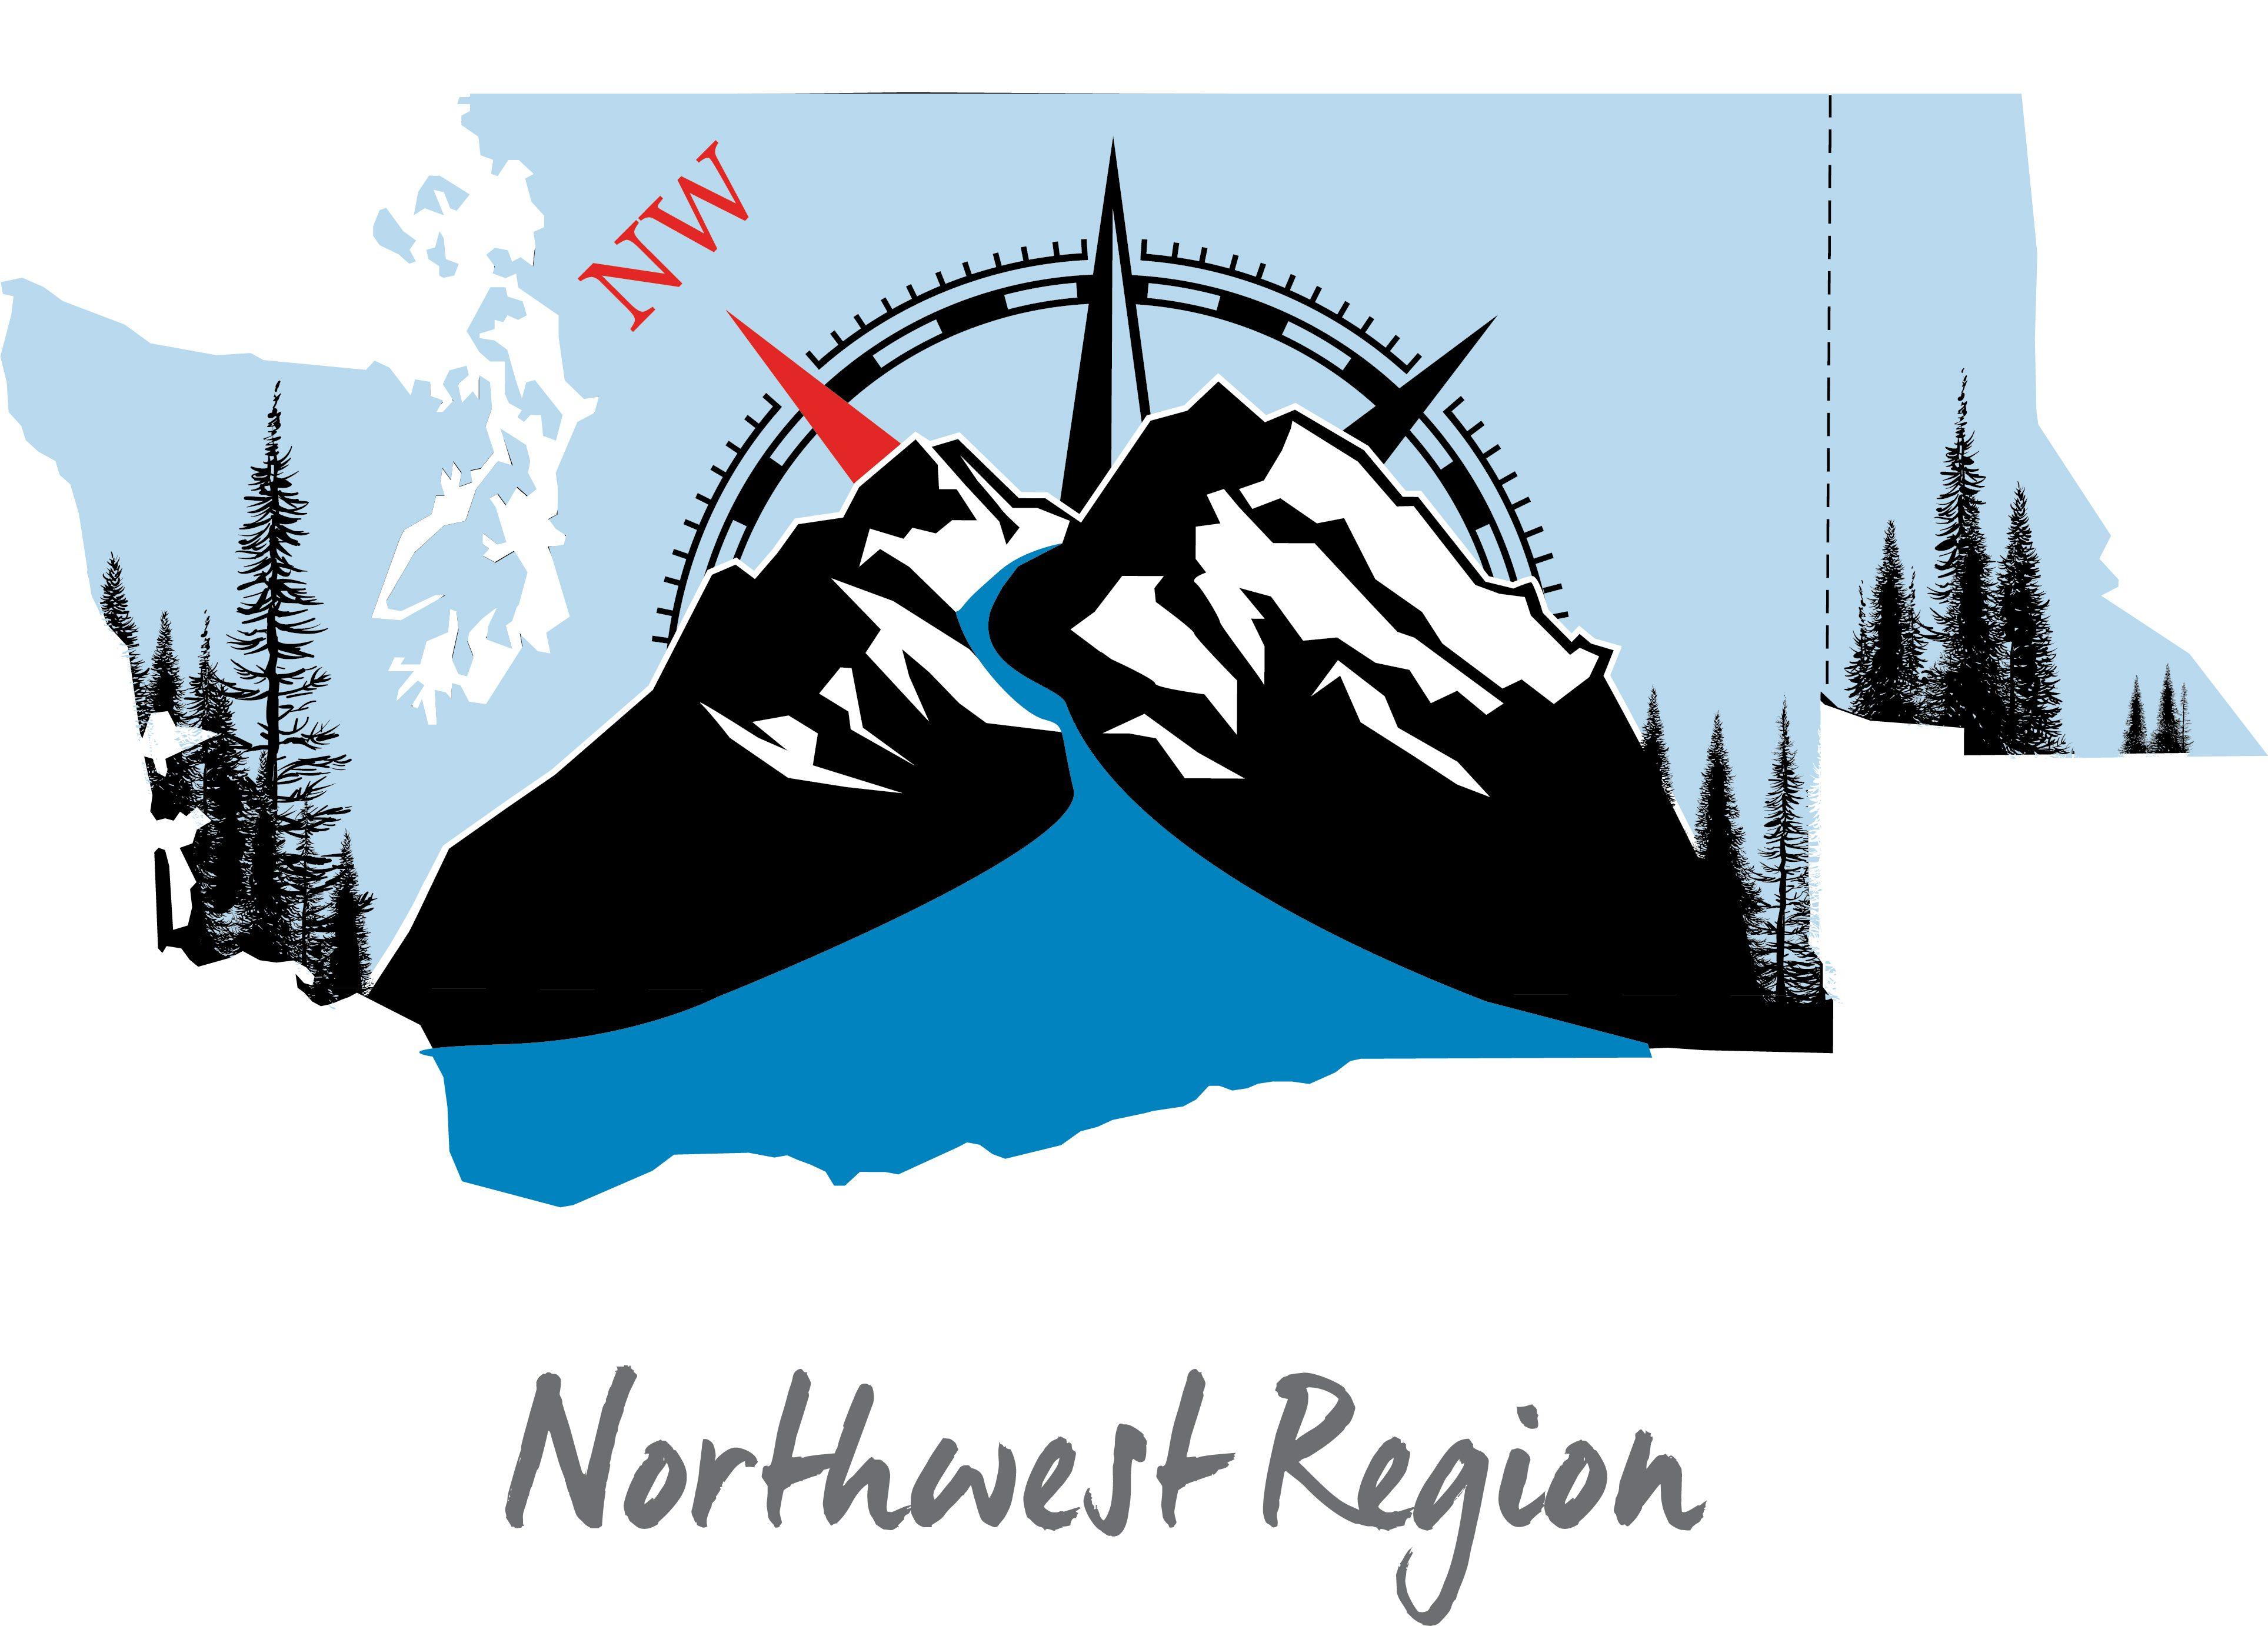 American Red Cross Northwest Region